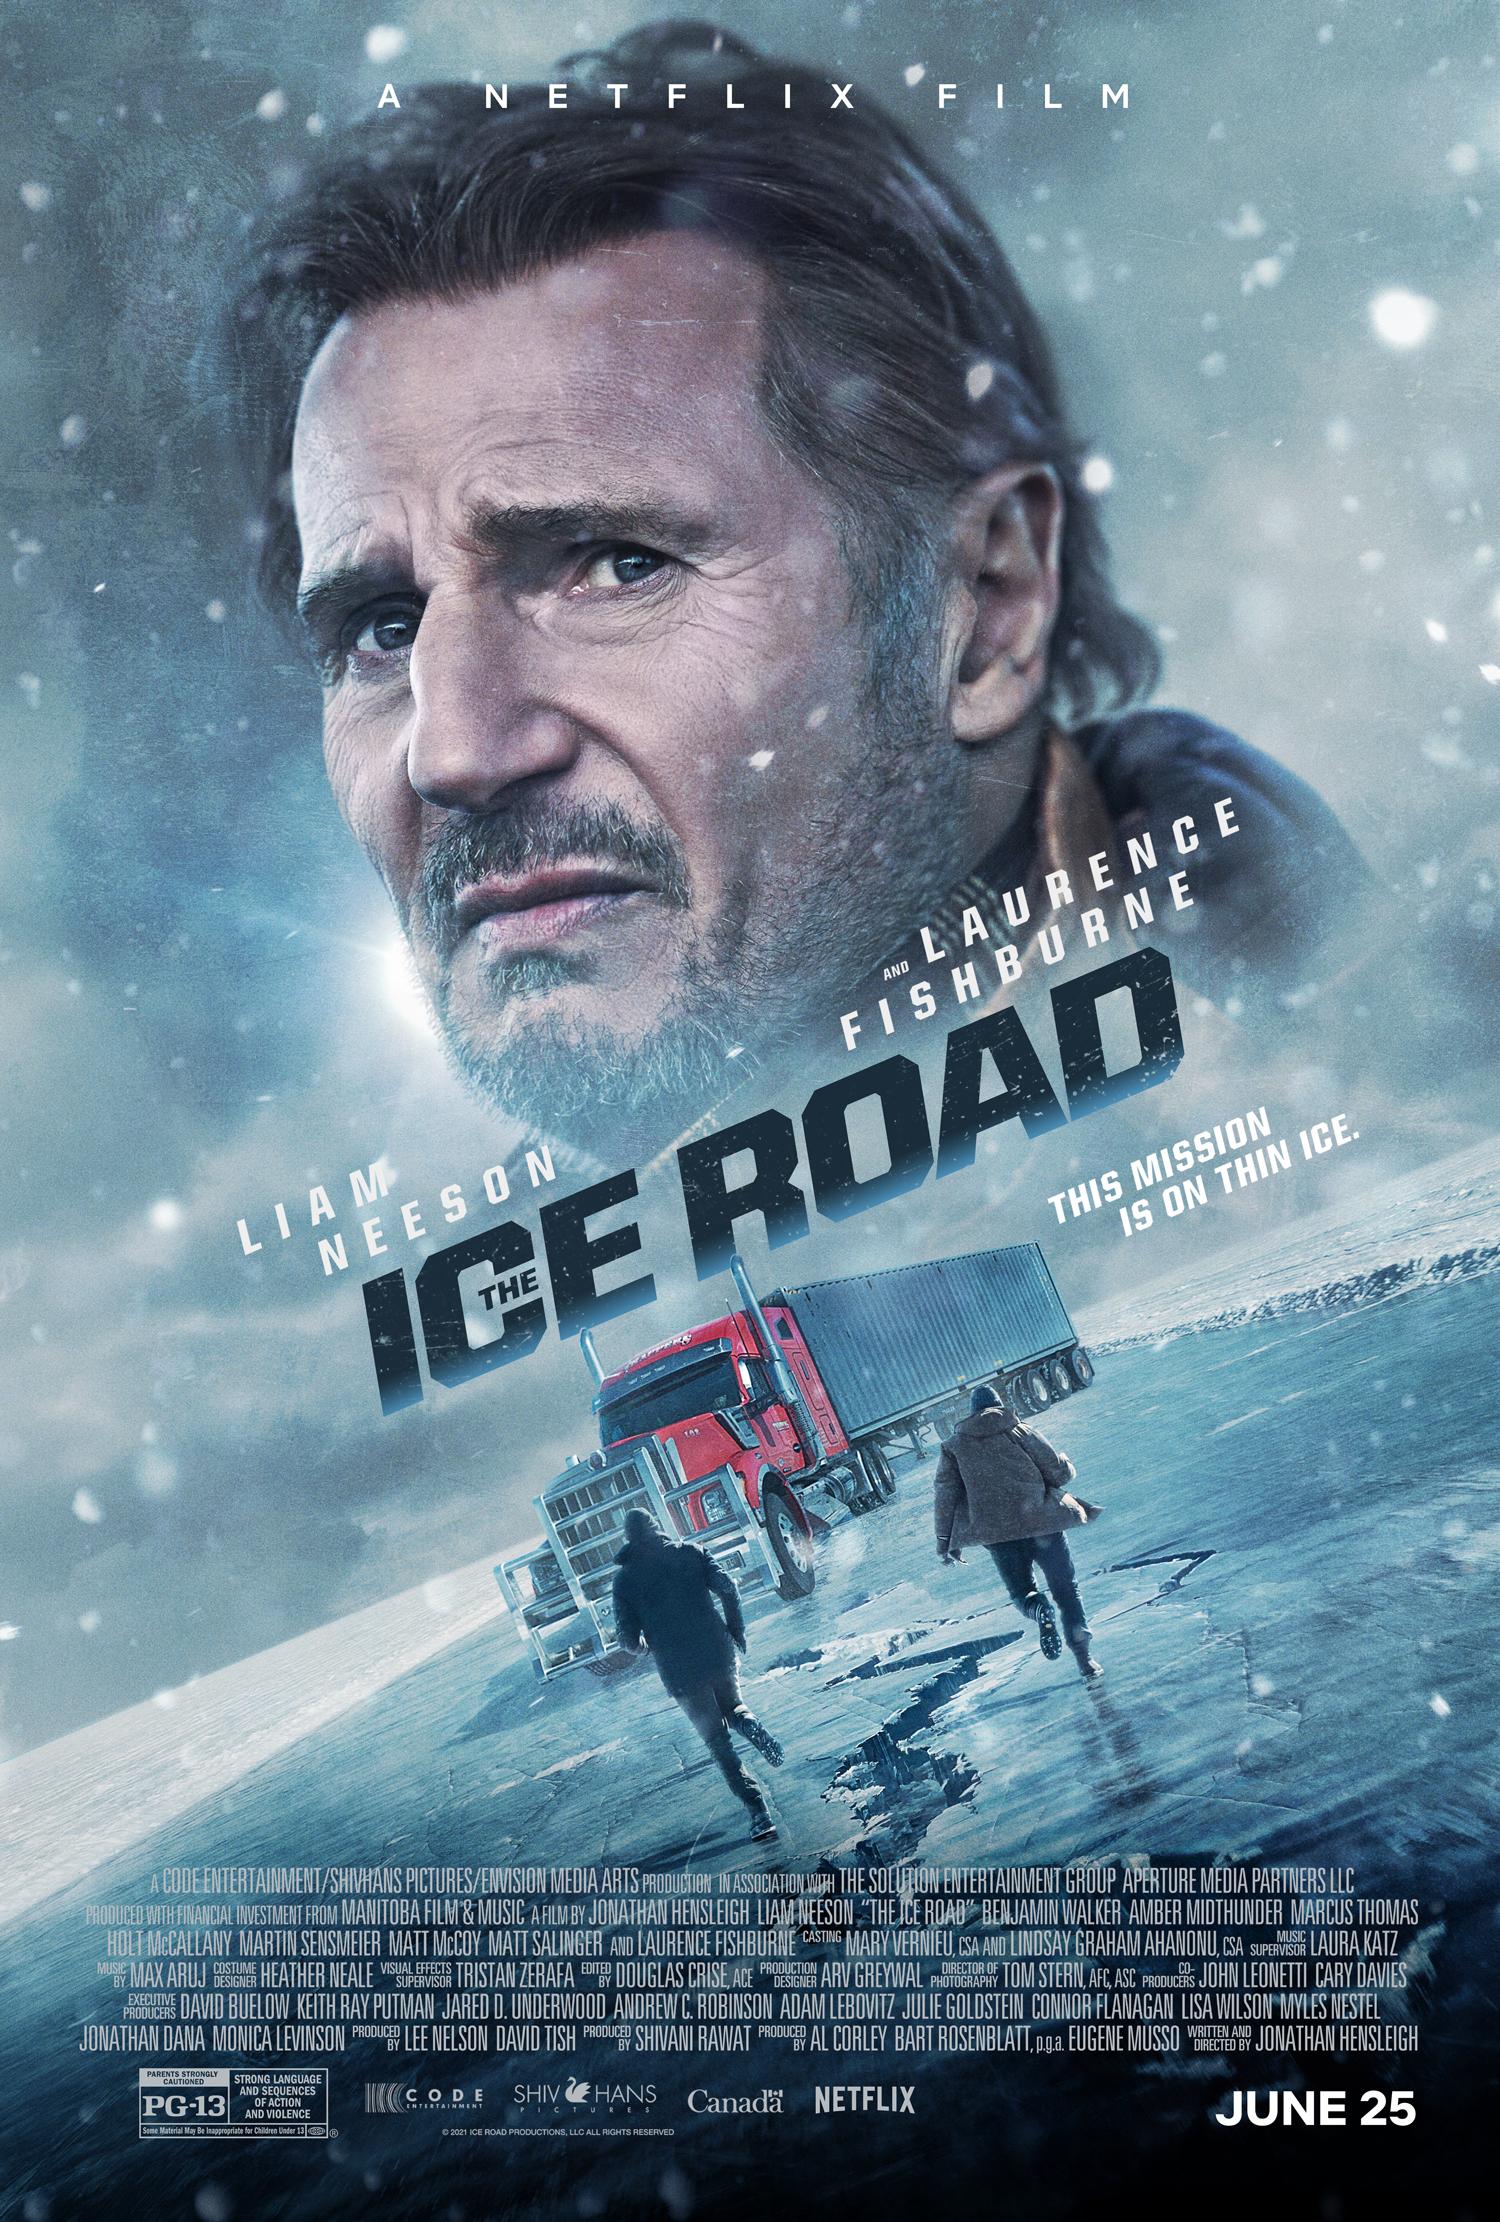 Movie: The Ice Road (2021)